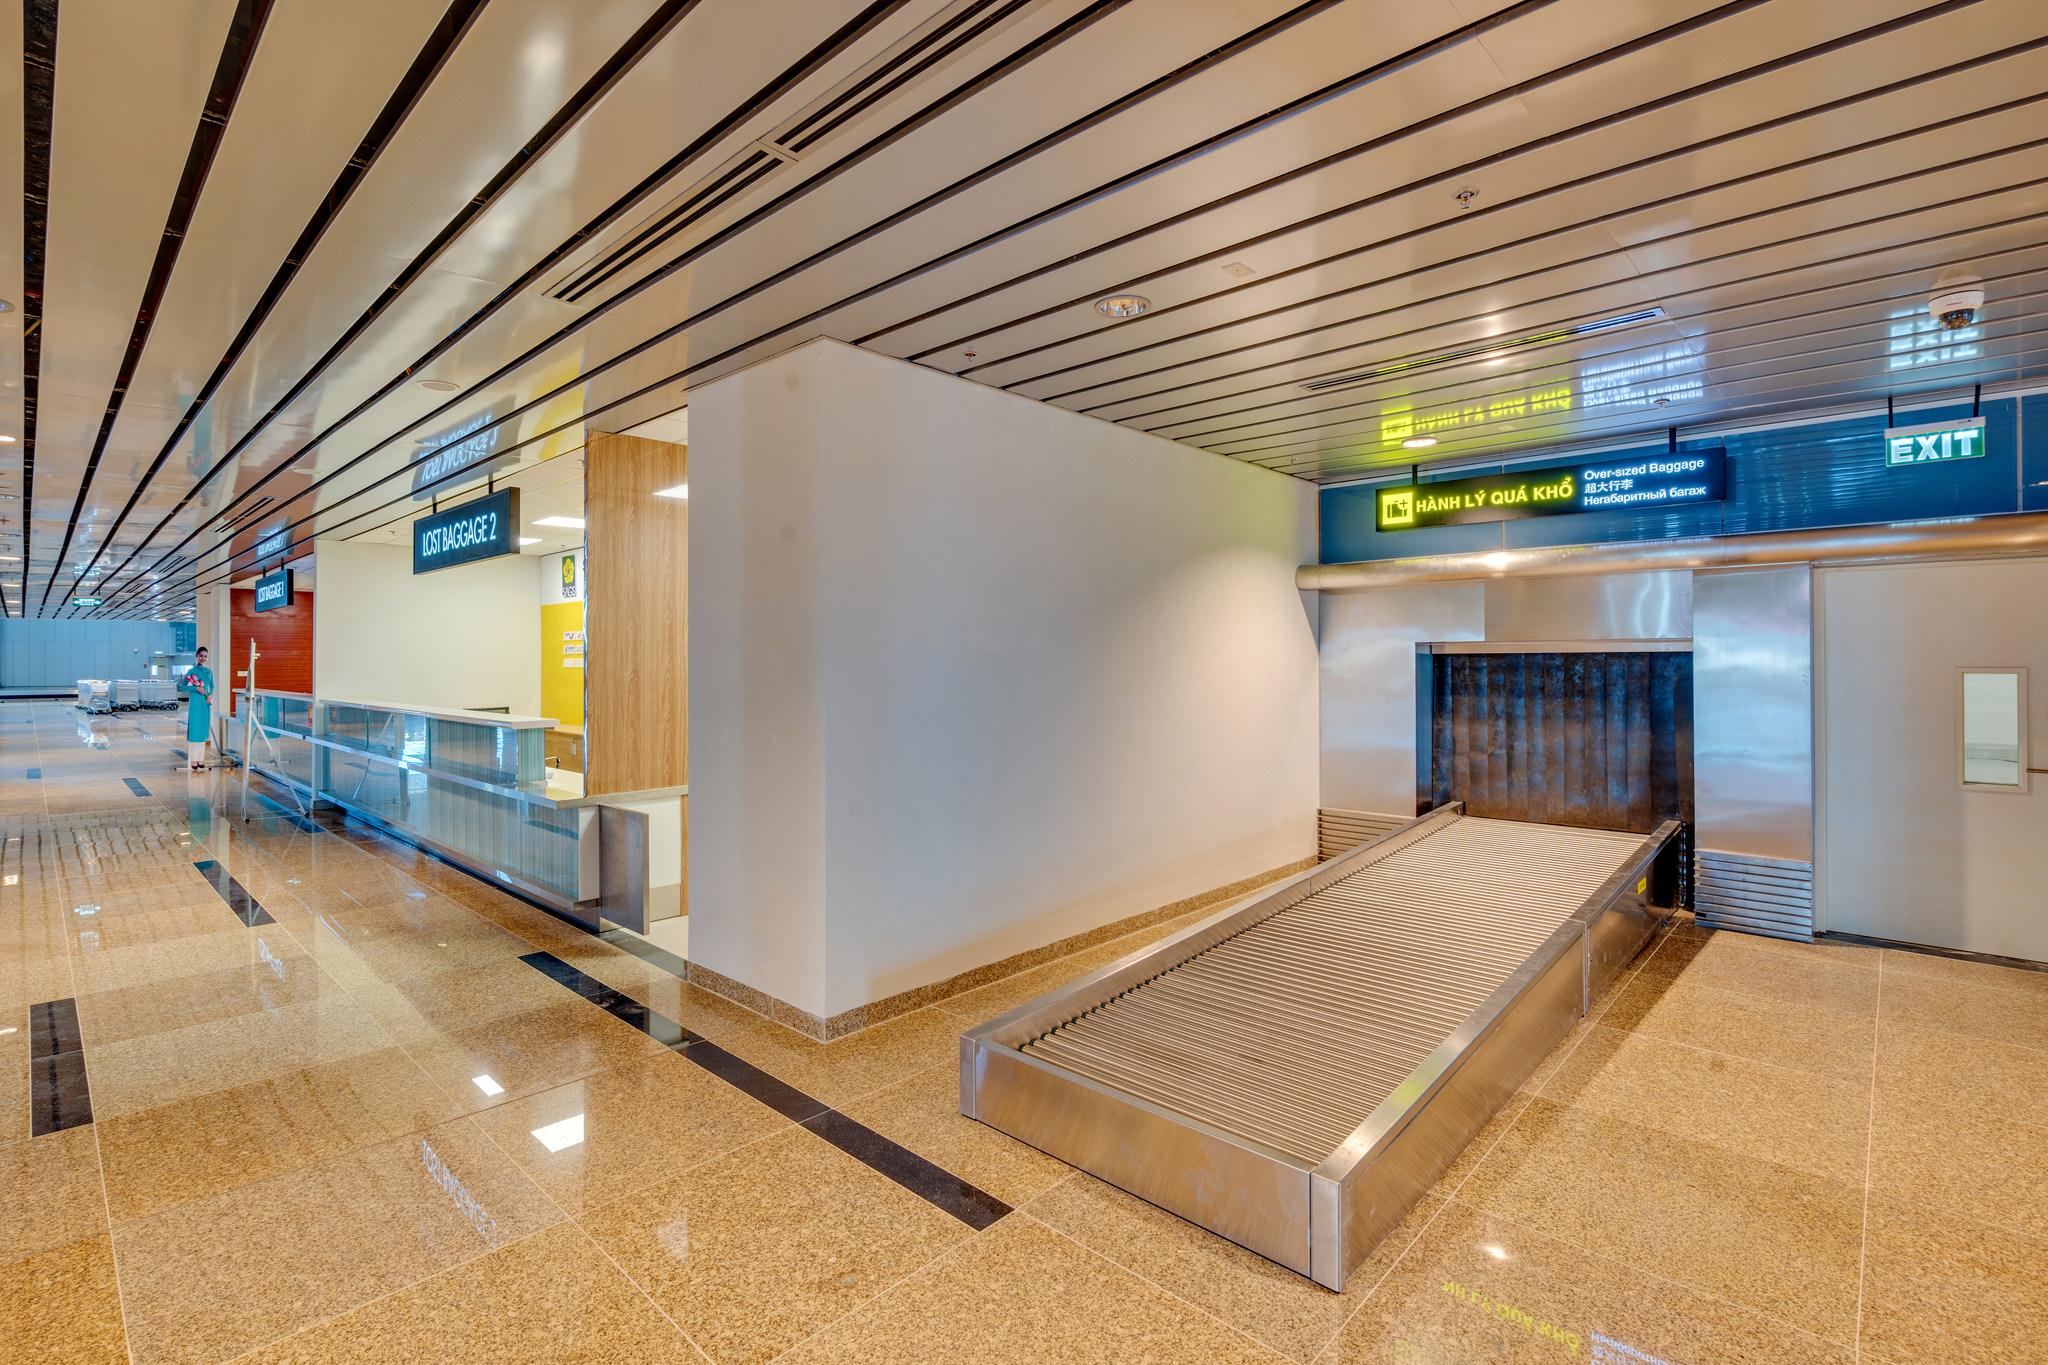 20180626 - Cam Ranh Airport - Architecture - 0138.jpg